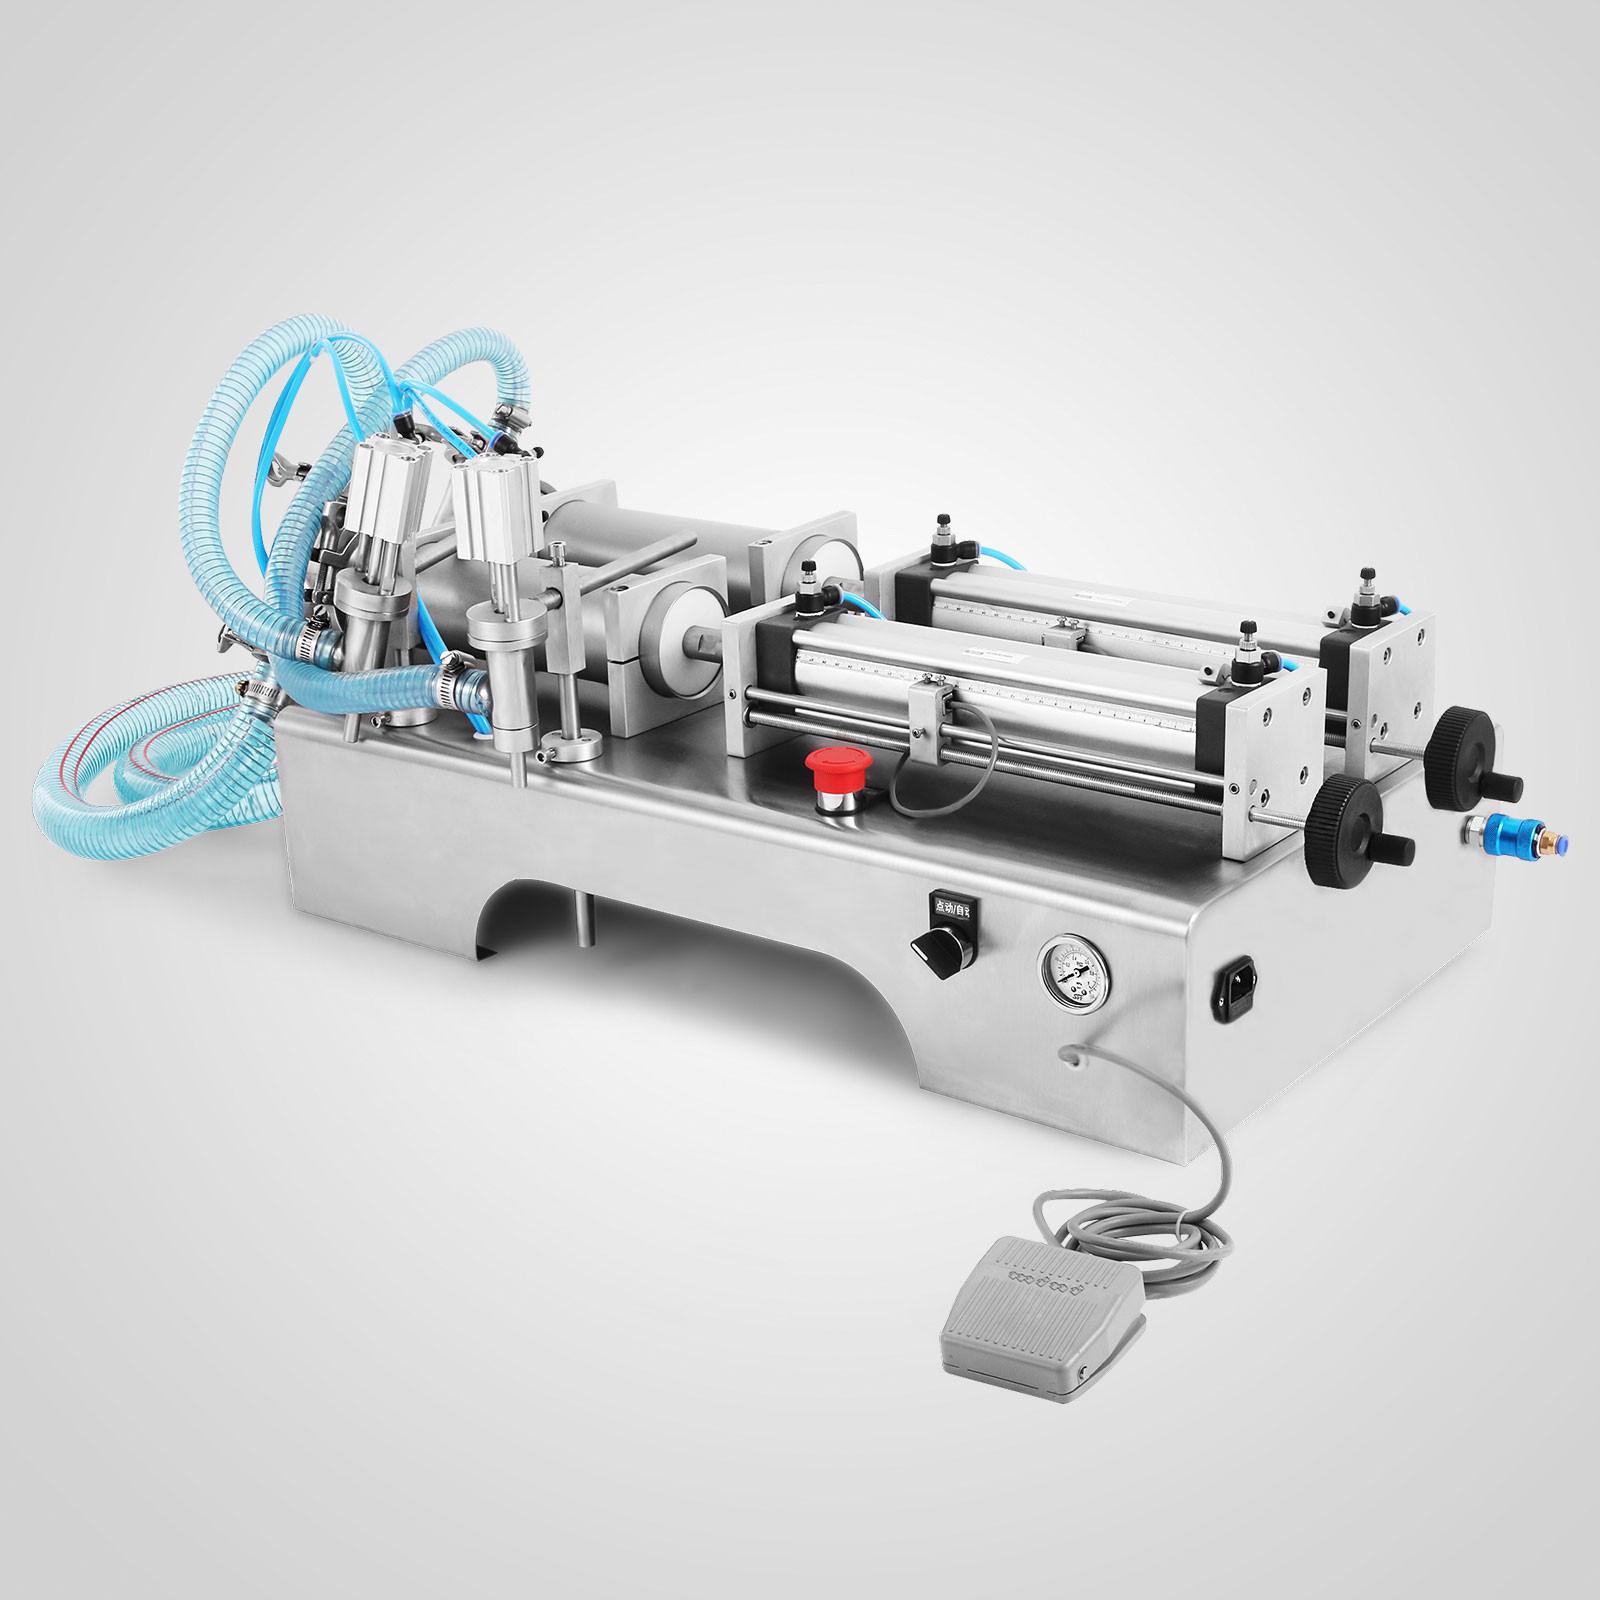 Liquid-Filling-Machine-Filler-Remplissage-2-3500ML-50-500ML-INDUSTRY-SUPPLY miniature 76